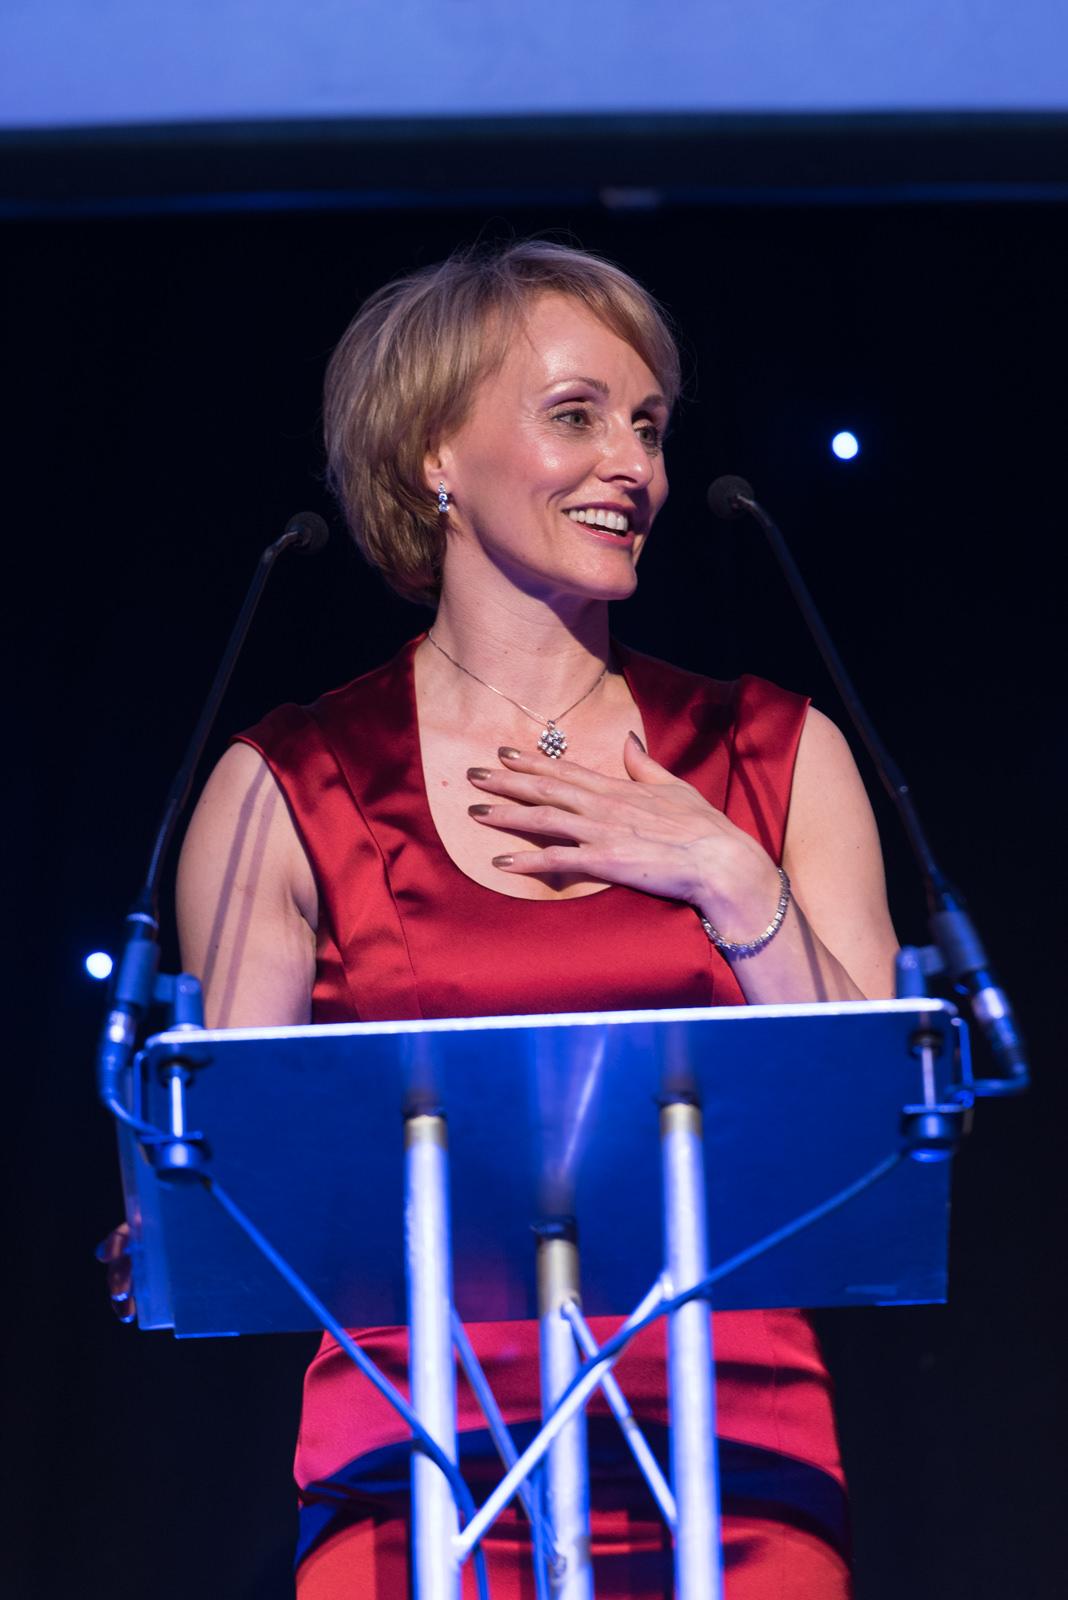 The Association of Scottish Businesswomen ASB Awards 2015 - Grand Central Hotel, Glasgow - 18 September 2015 © Julie Broadfoot - www.juliebee.co.uk